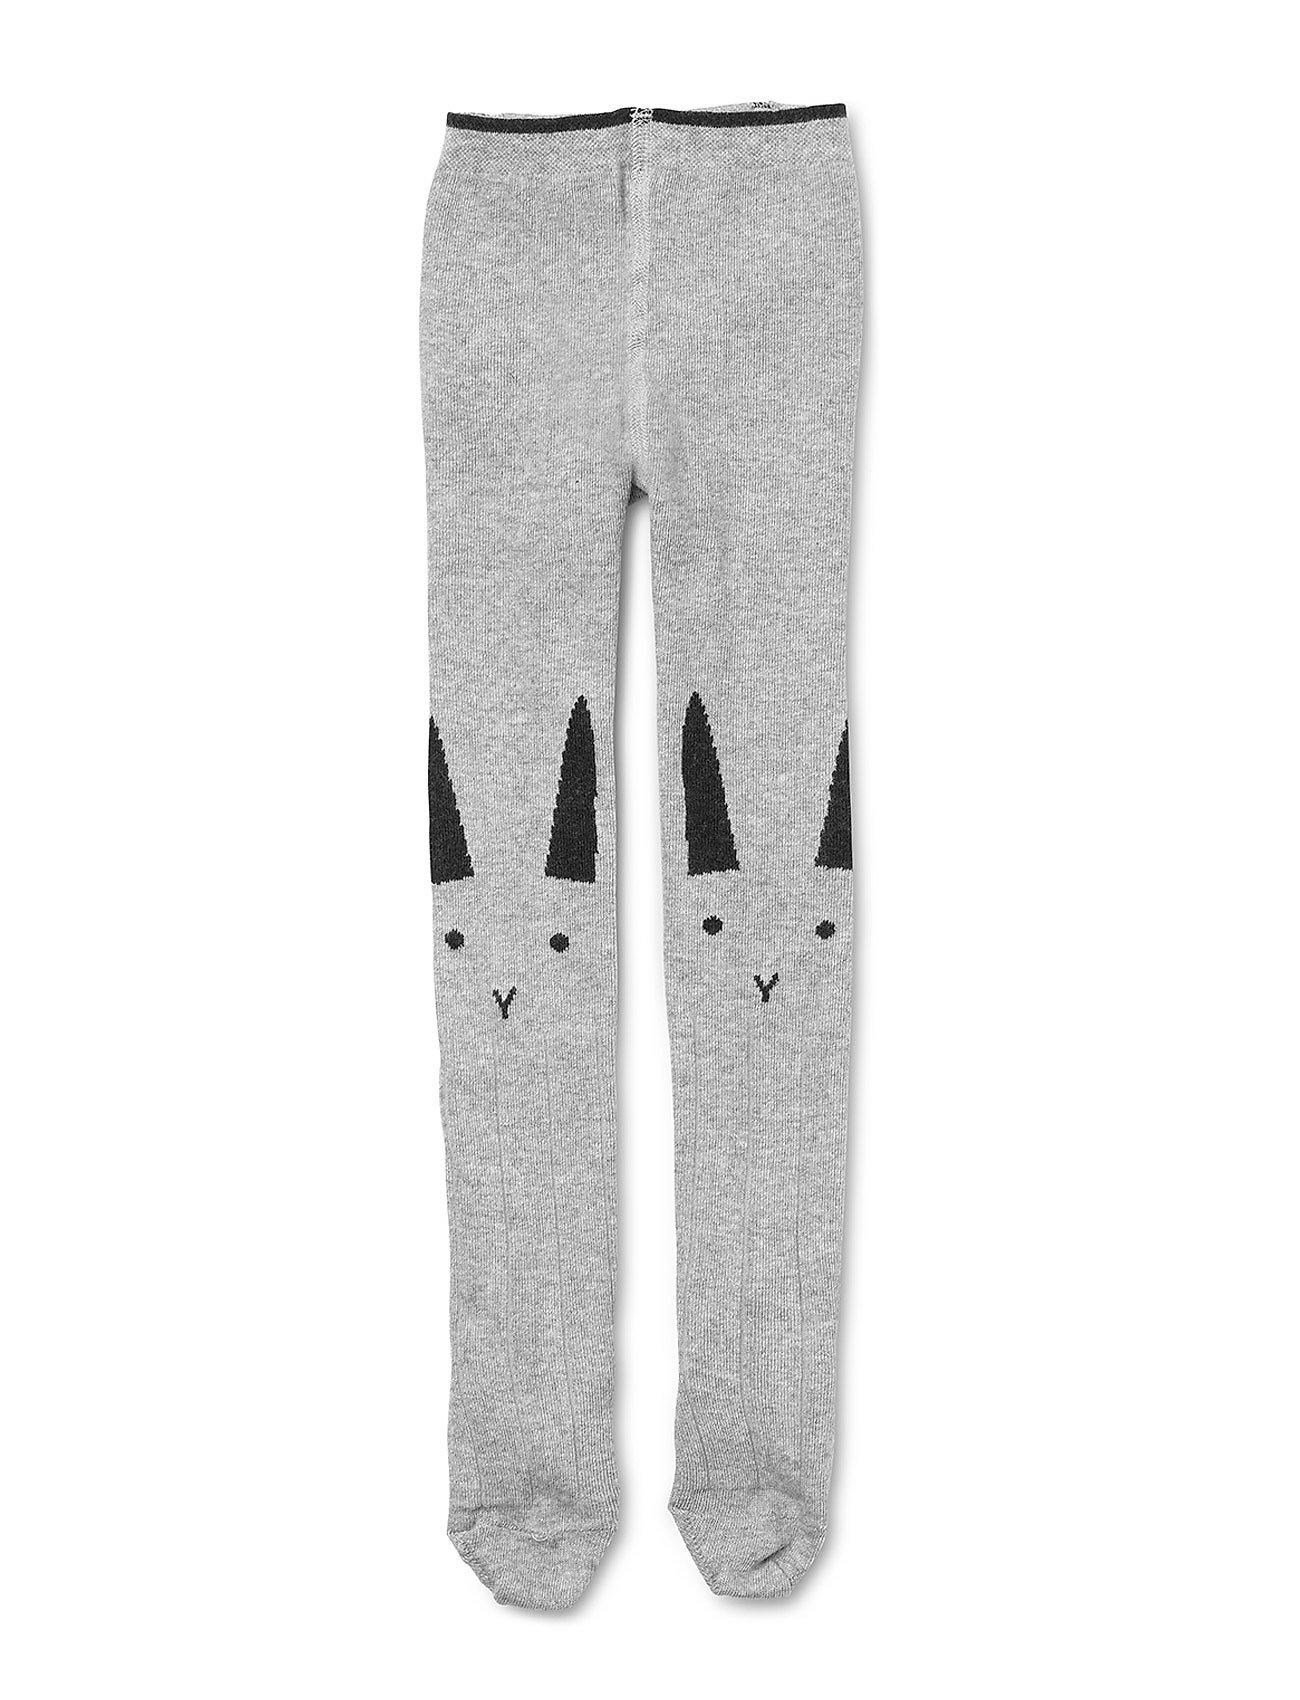 Liewood Stockings rabbit